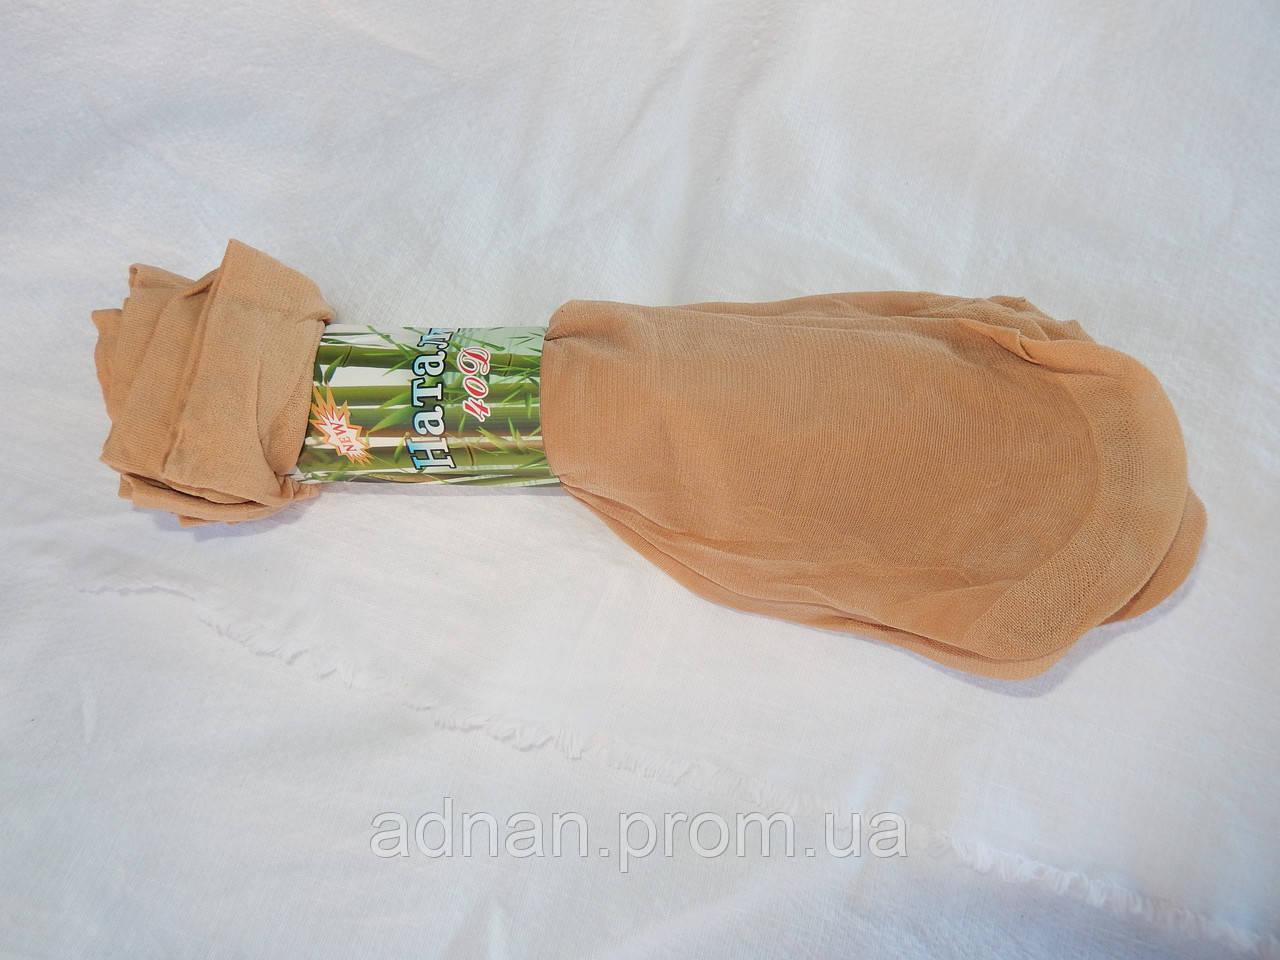 Носки женские размер 36-40 / купить женские носки оптом оптом